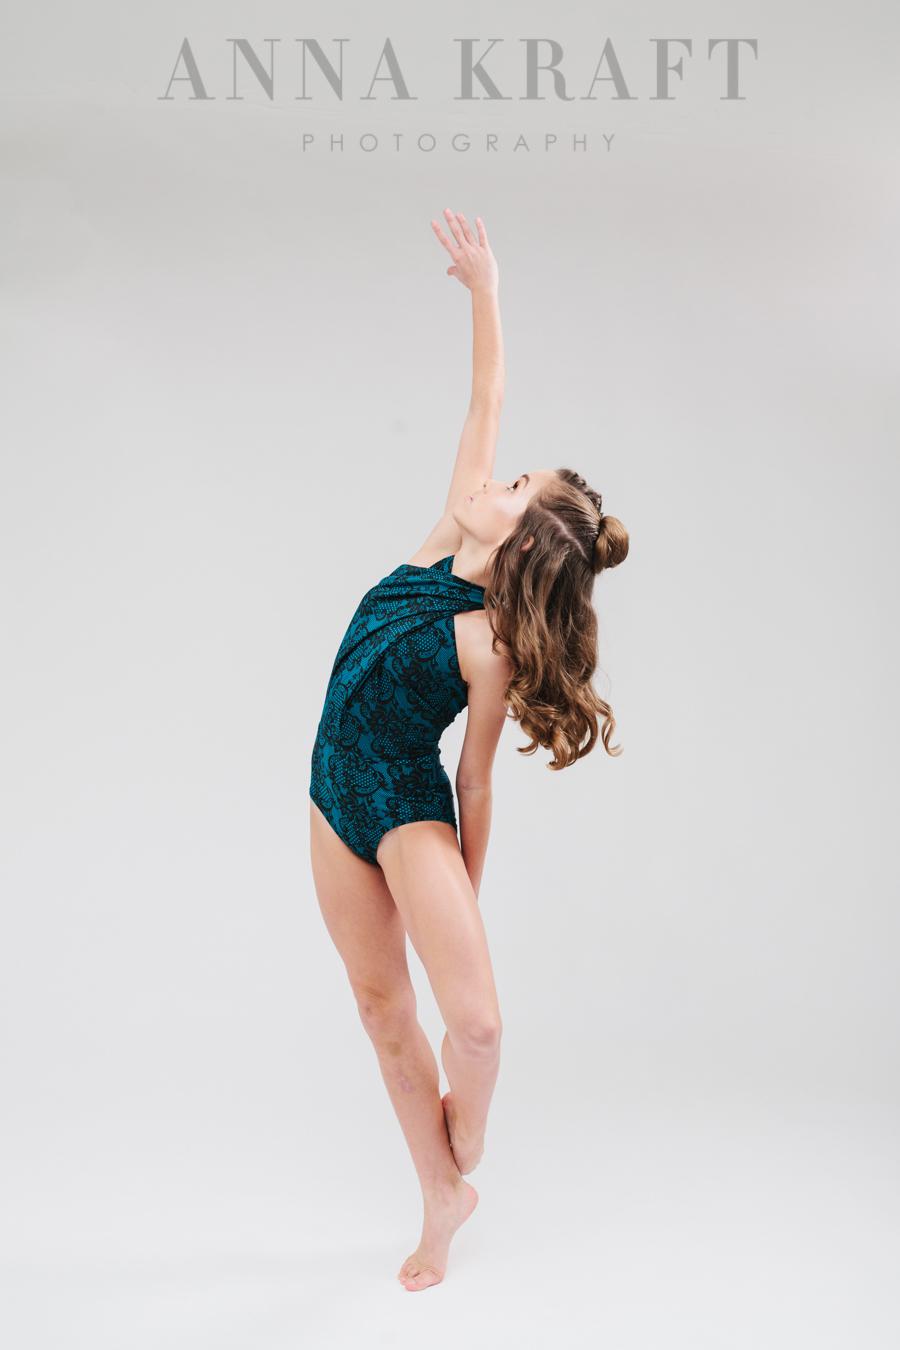 anna_kraft_photography_georgetown_square_studio_dance_portrait-5.jpg